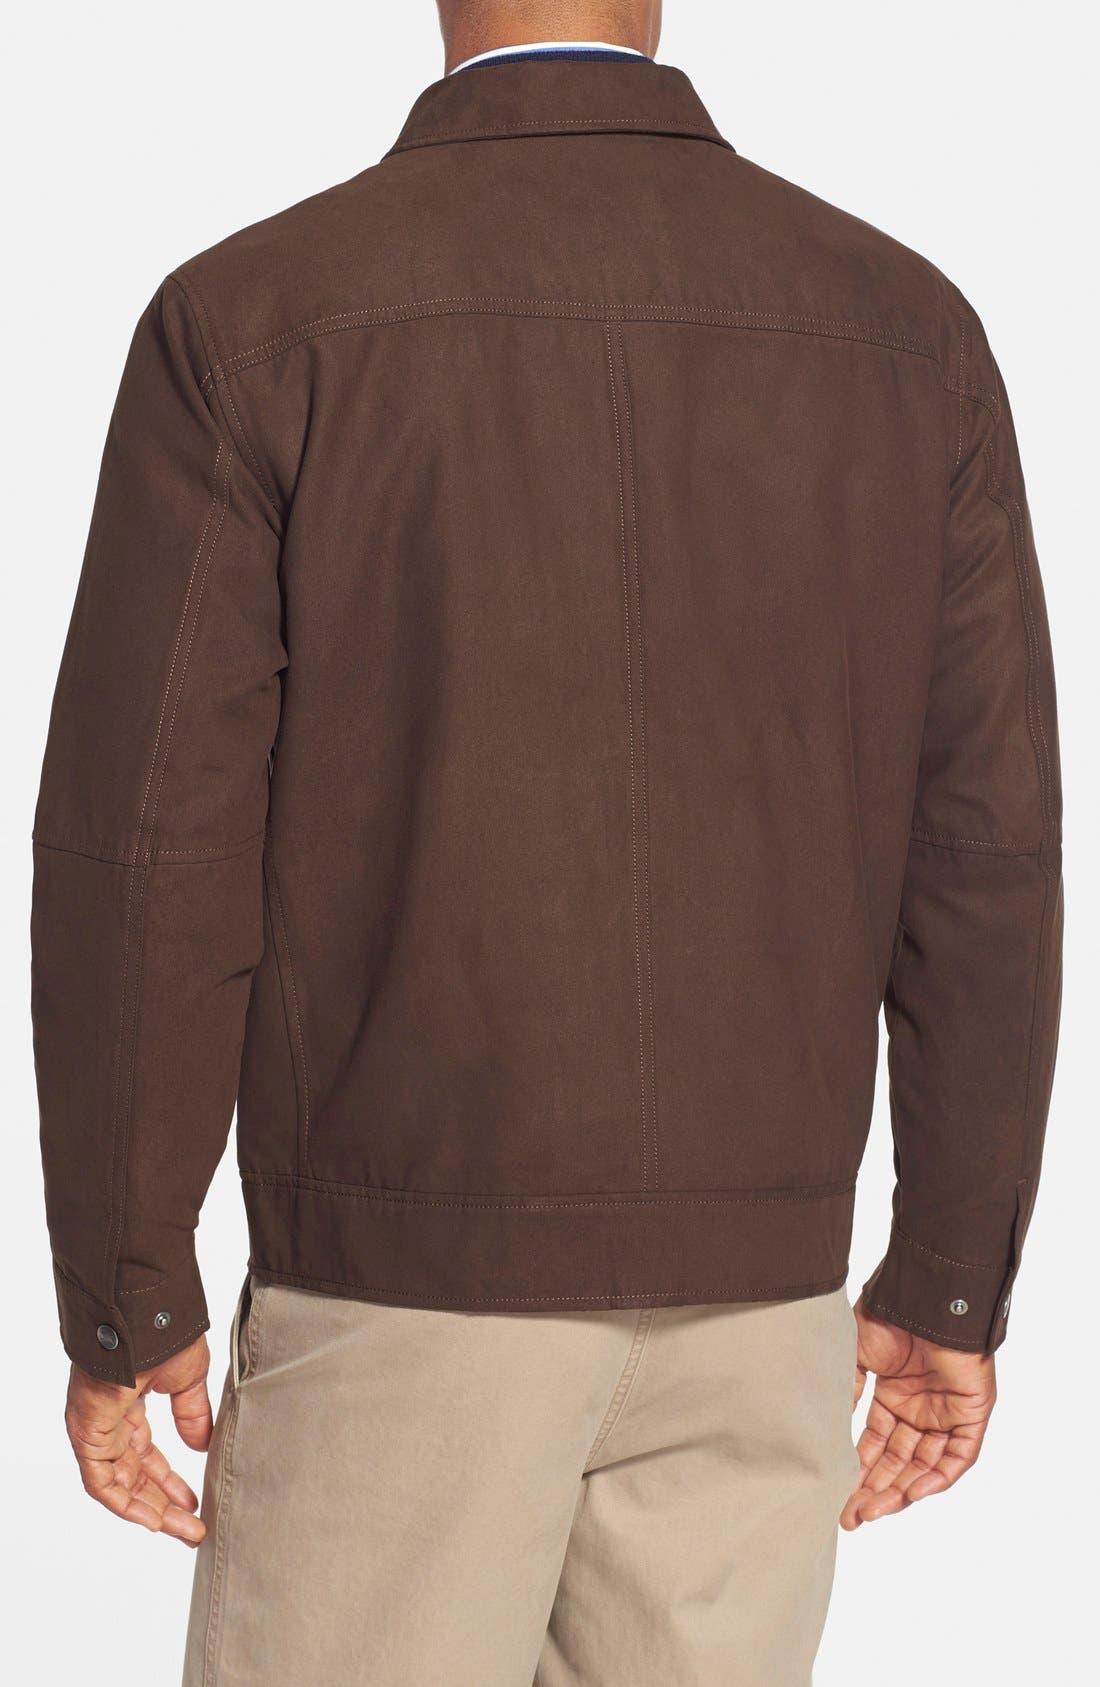 'Roosevelt' Classic Fit Water Resistant Full Zip Jacket,                             Alternate thumbnail 2, color,                             BITTERSWEET BROWN